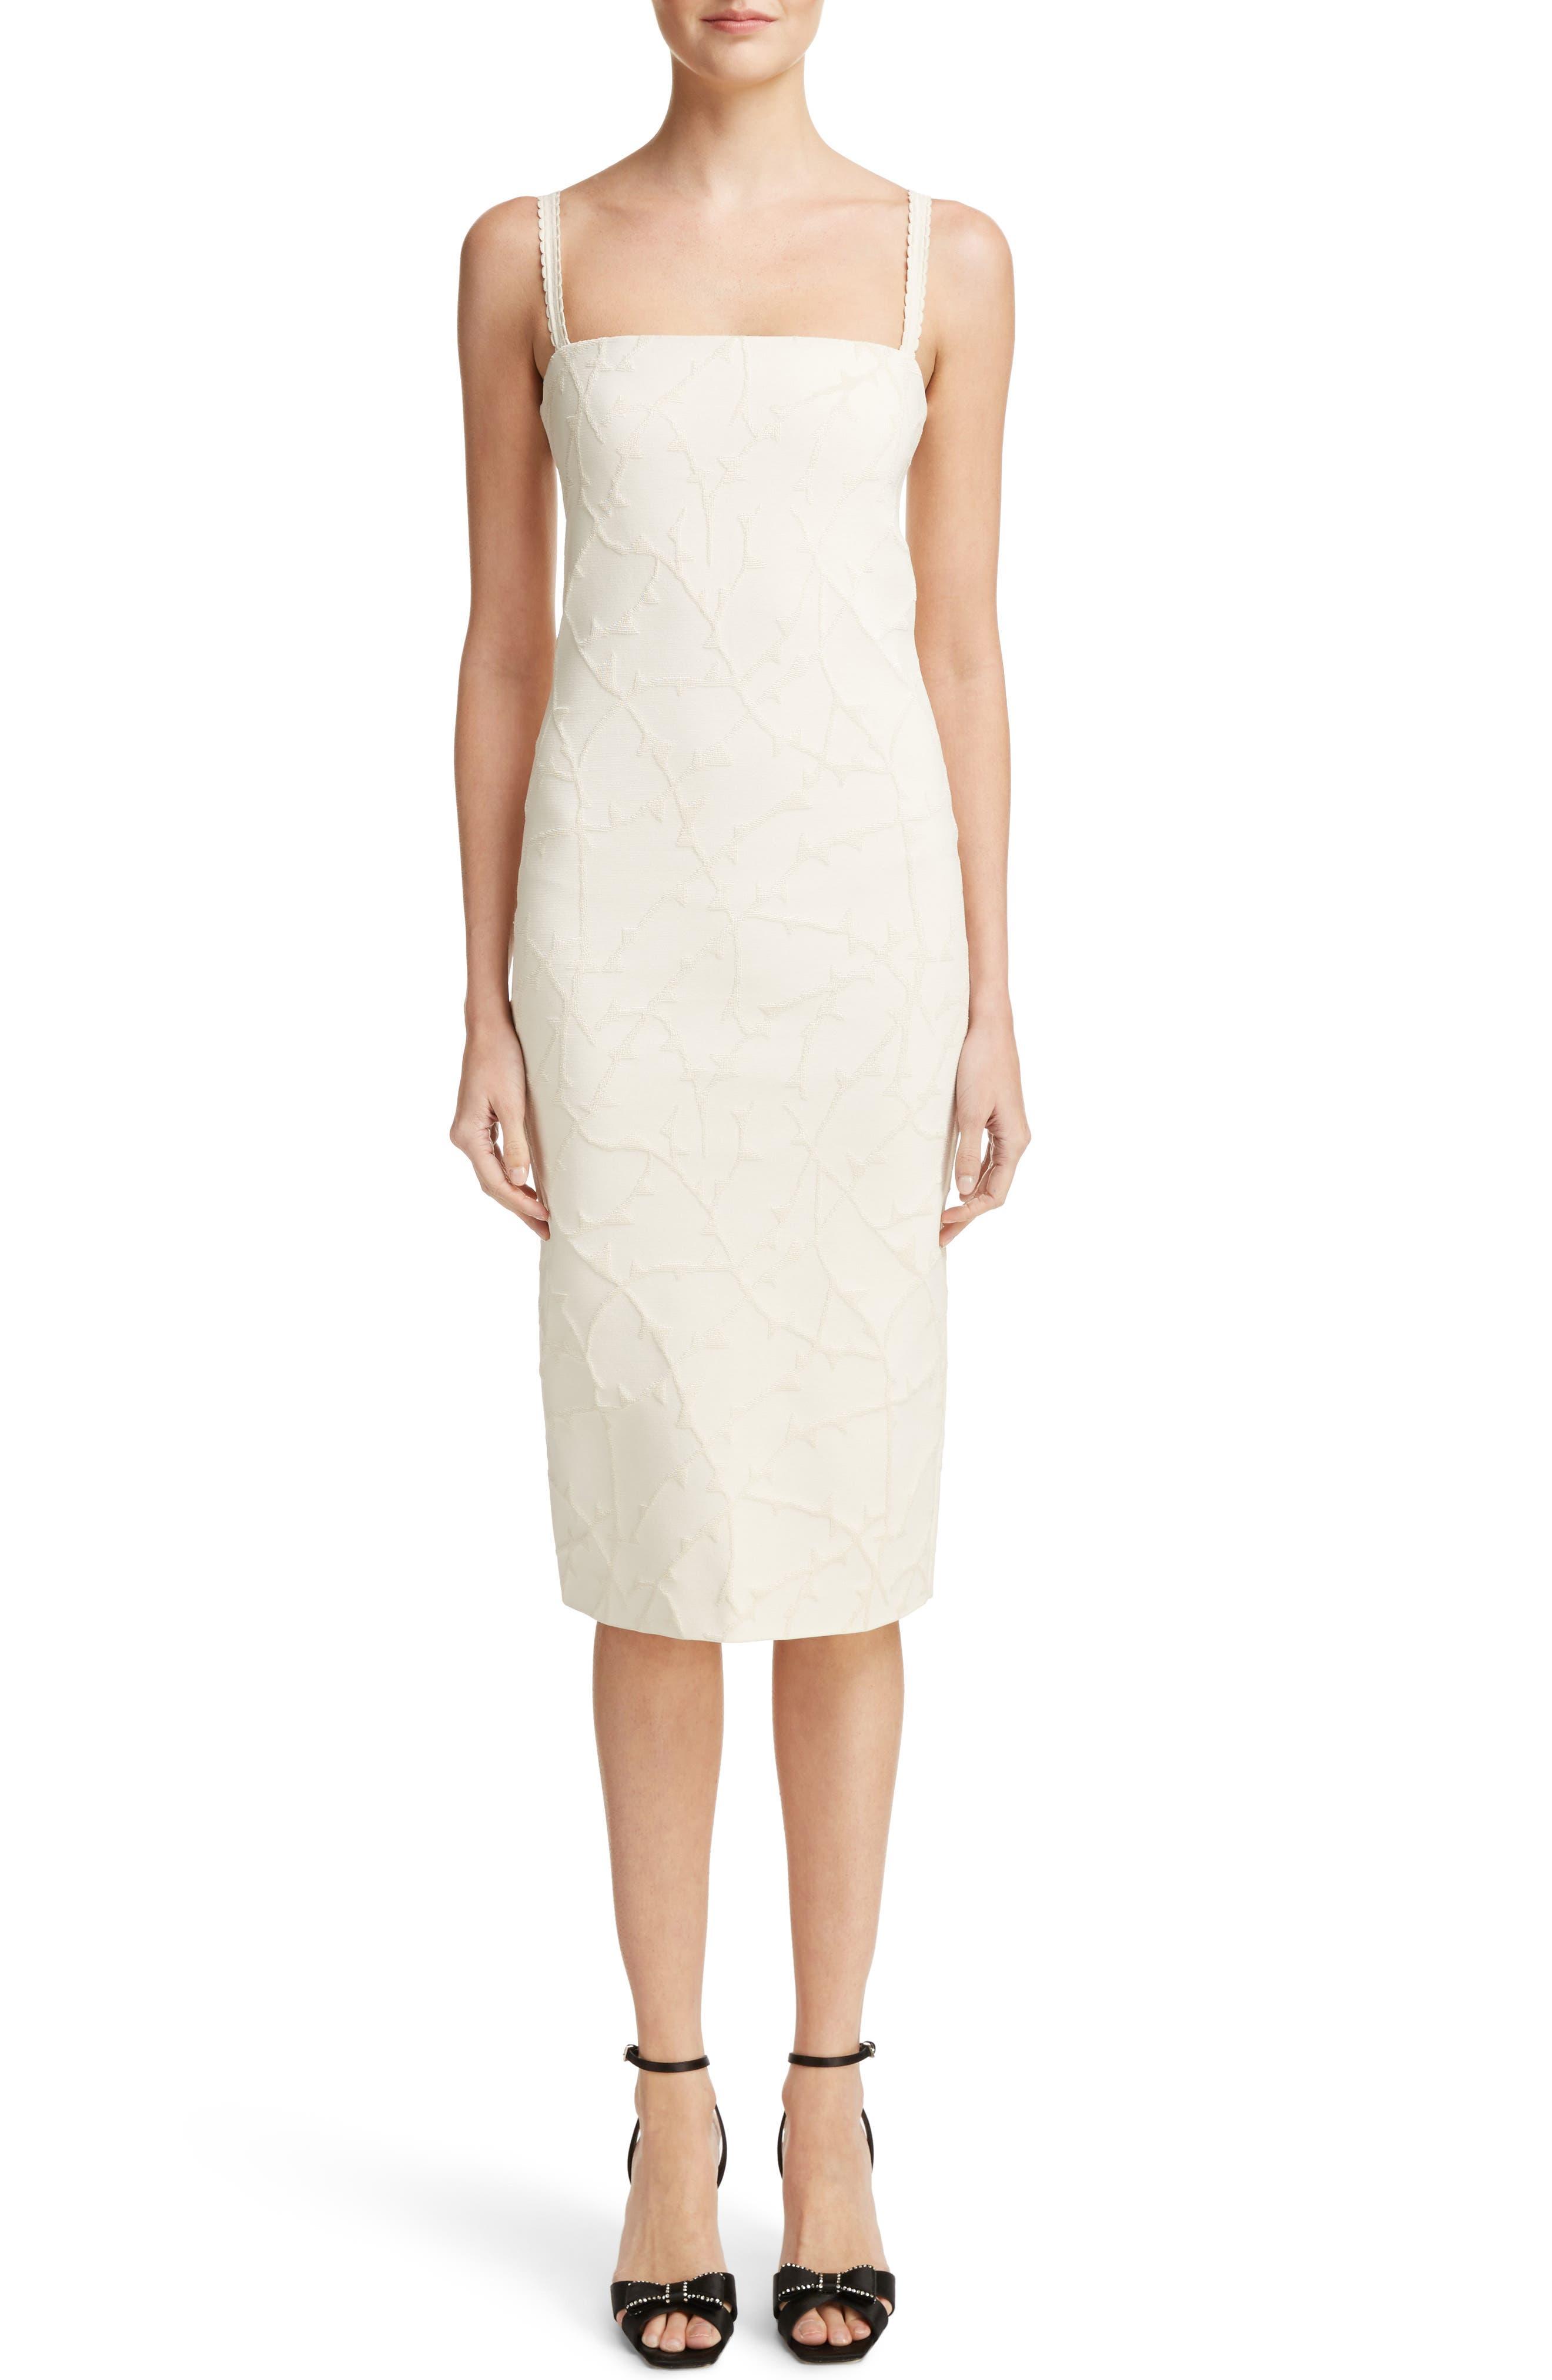 Main Image - Loewe Jacquard Knit Dress